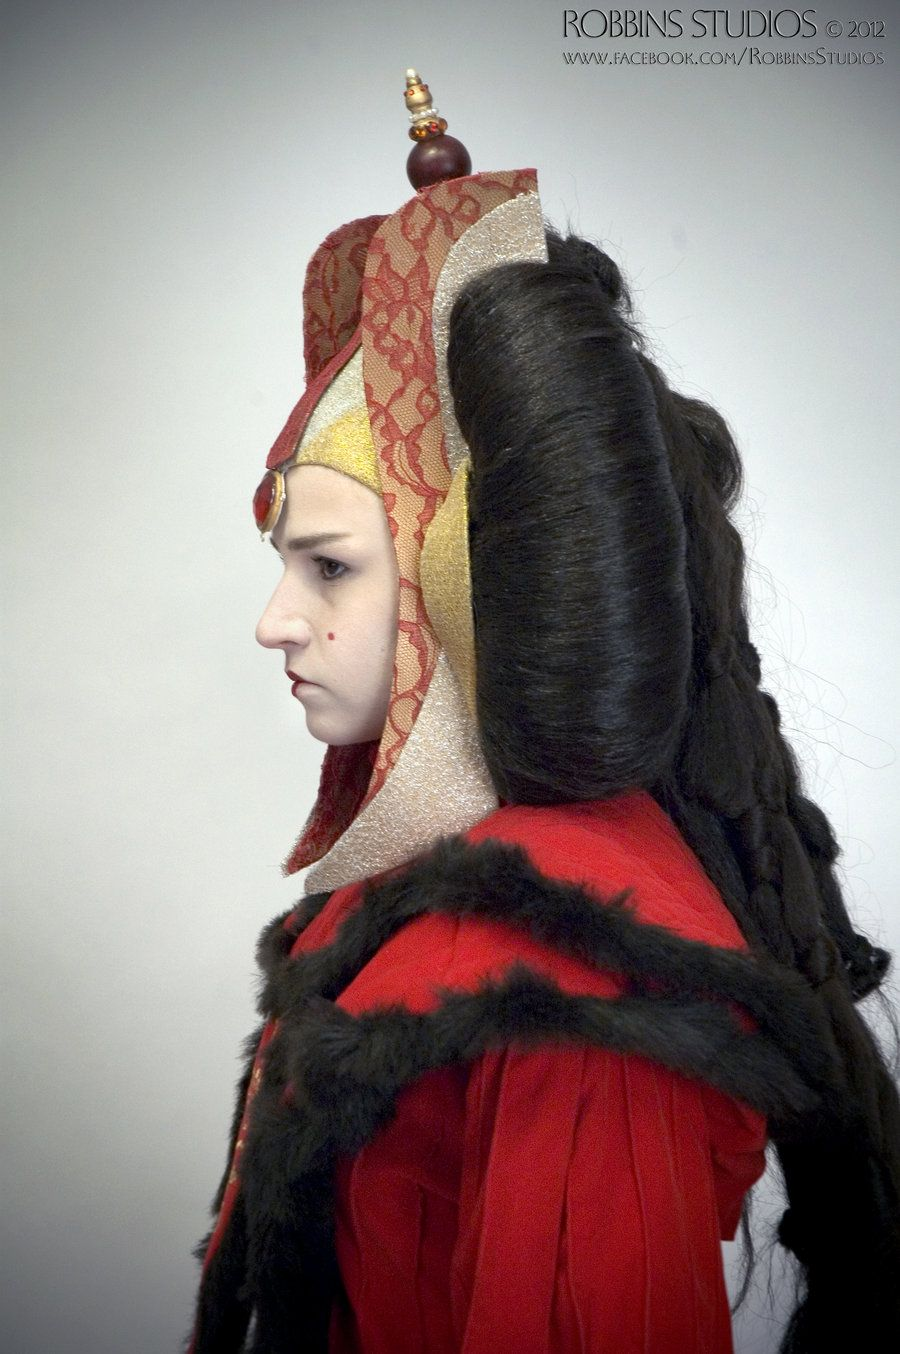 Queen amidala throne room cosplay google search - Princesse amidala ...